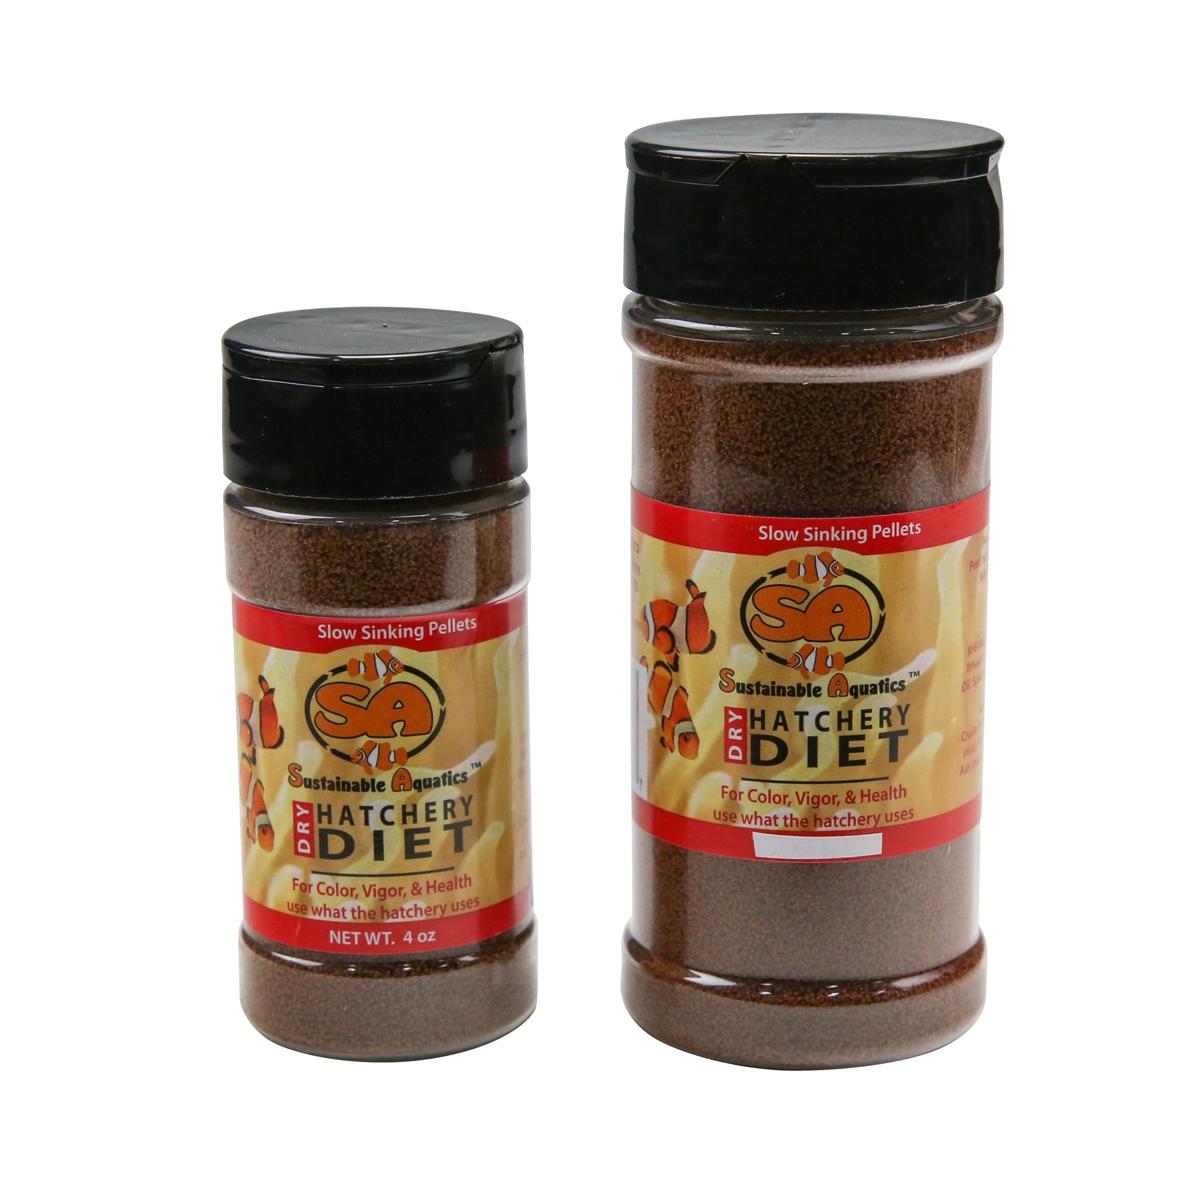 www.bulkreefsupply.com